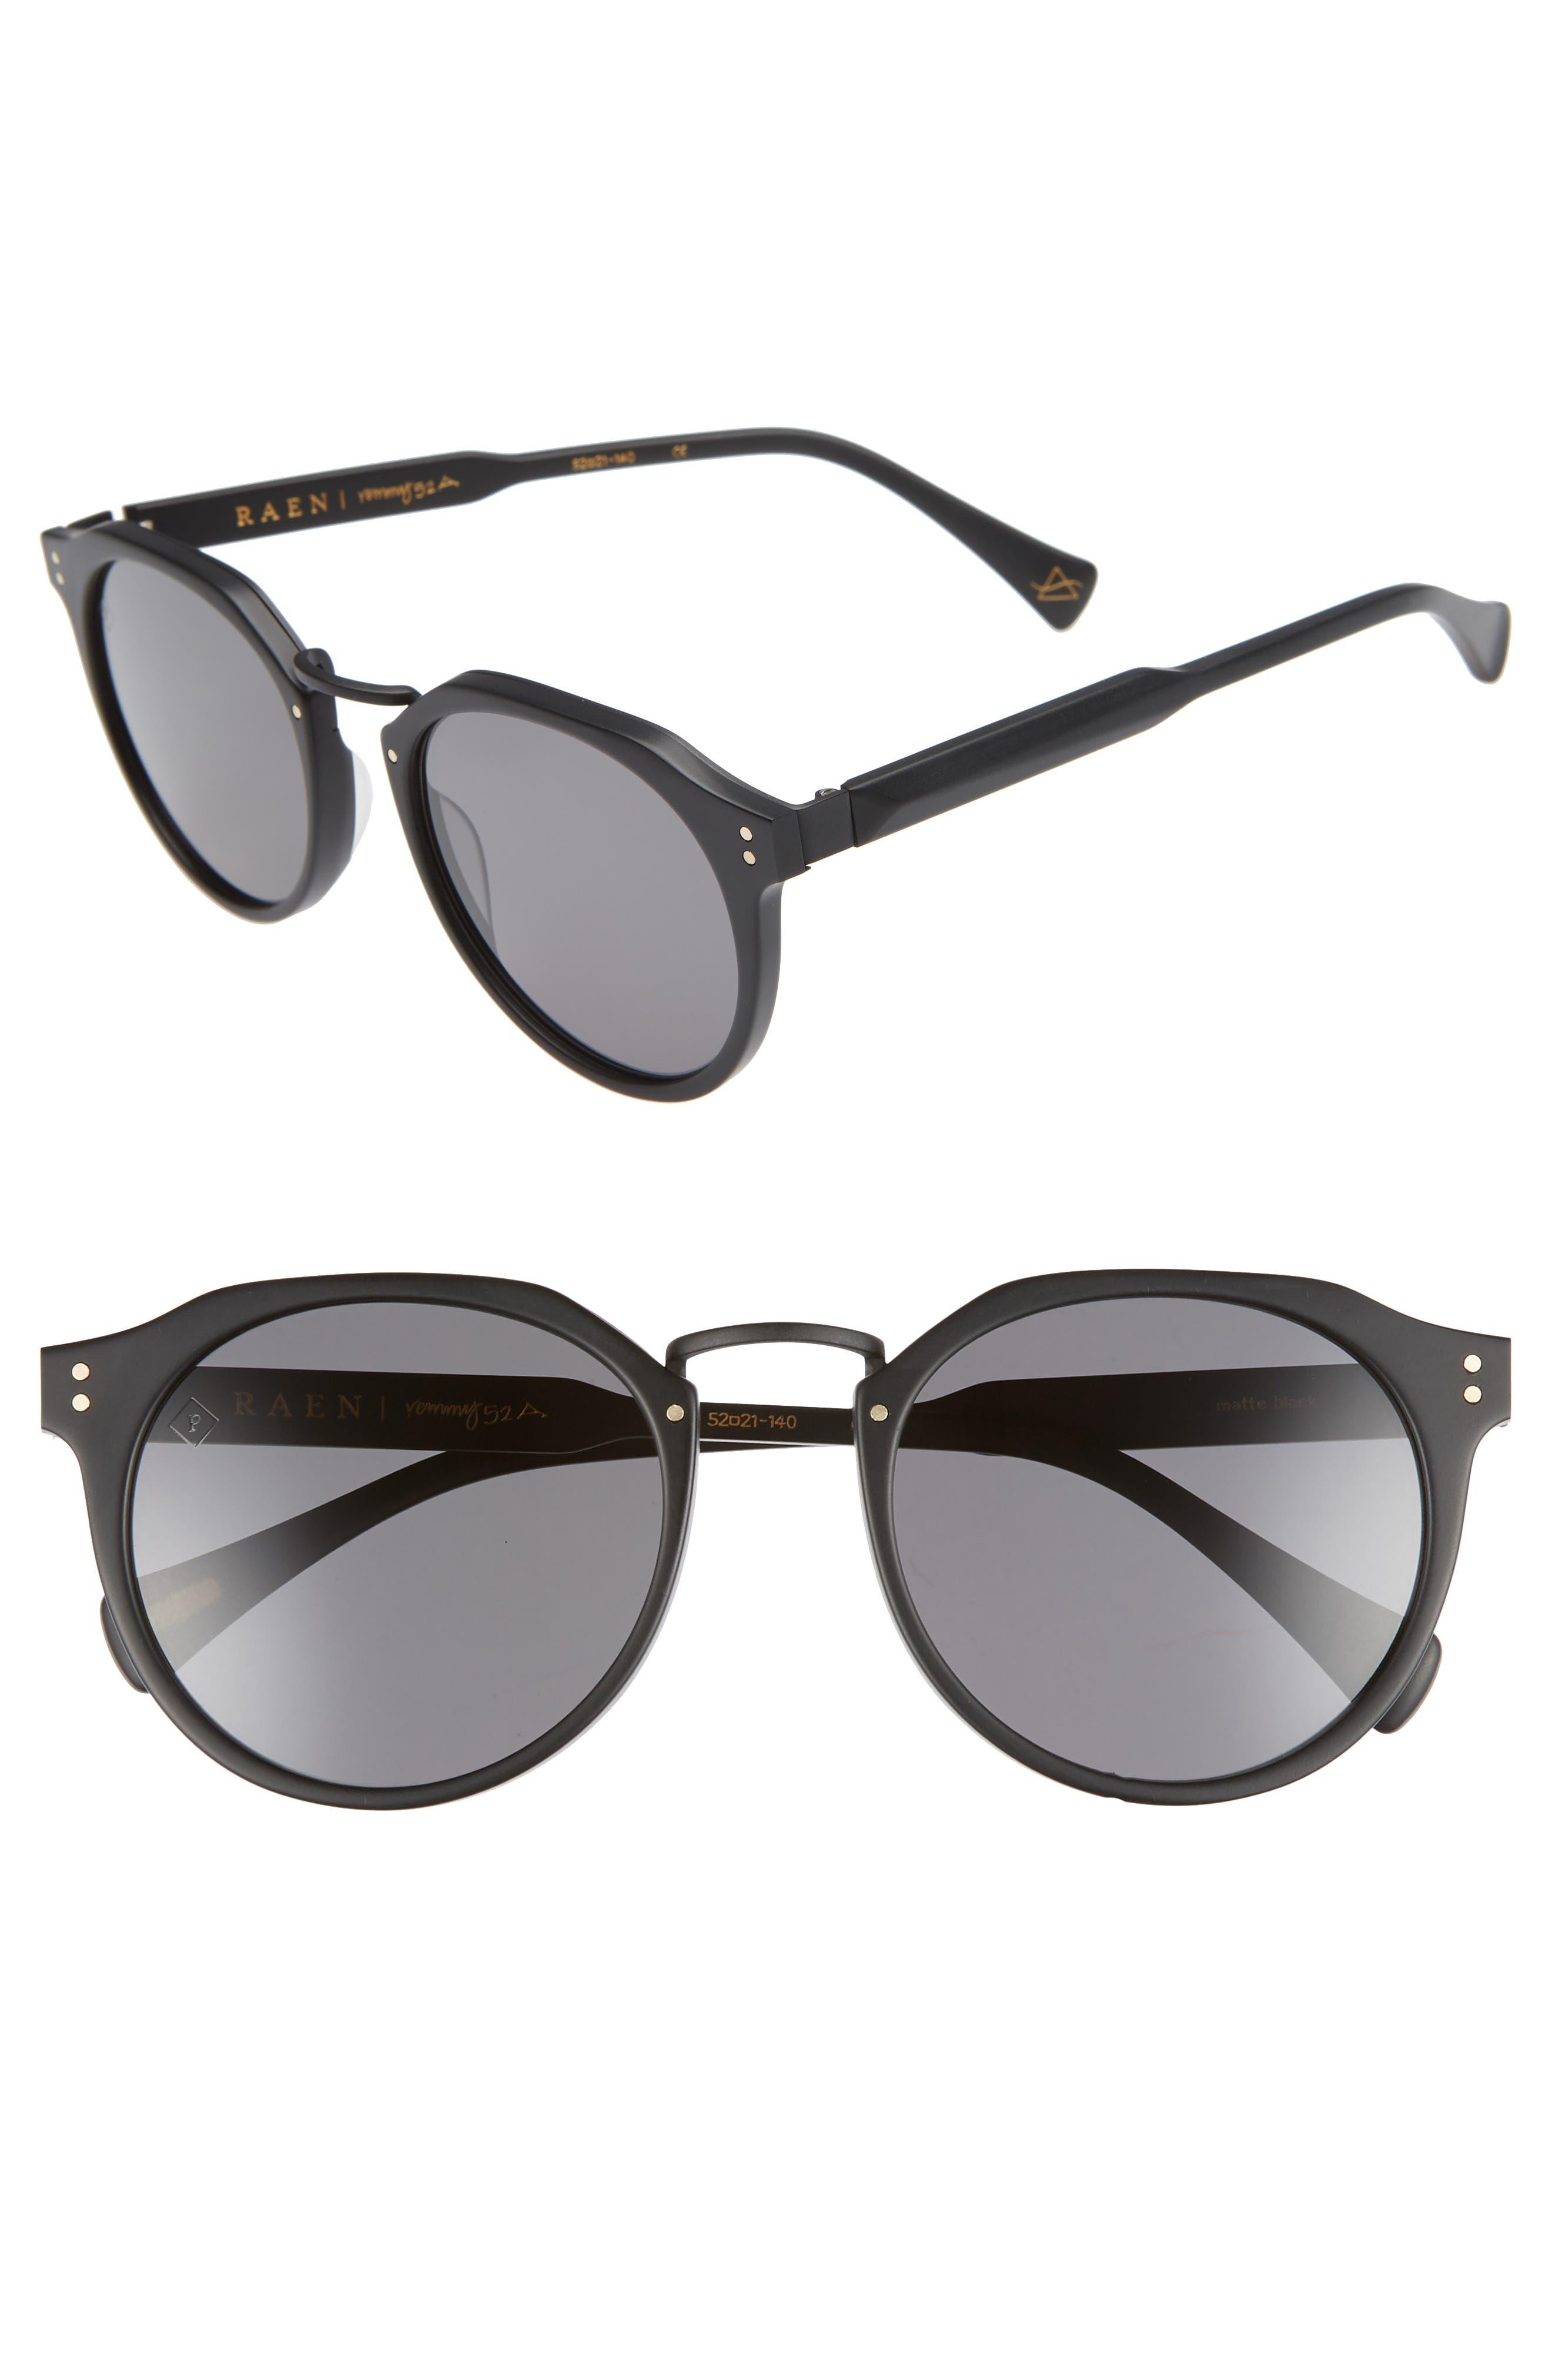 Remmy 52mm Sunglasses,                             Main thumbnail 1, color,                             Kola Tortoise